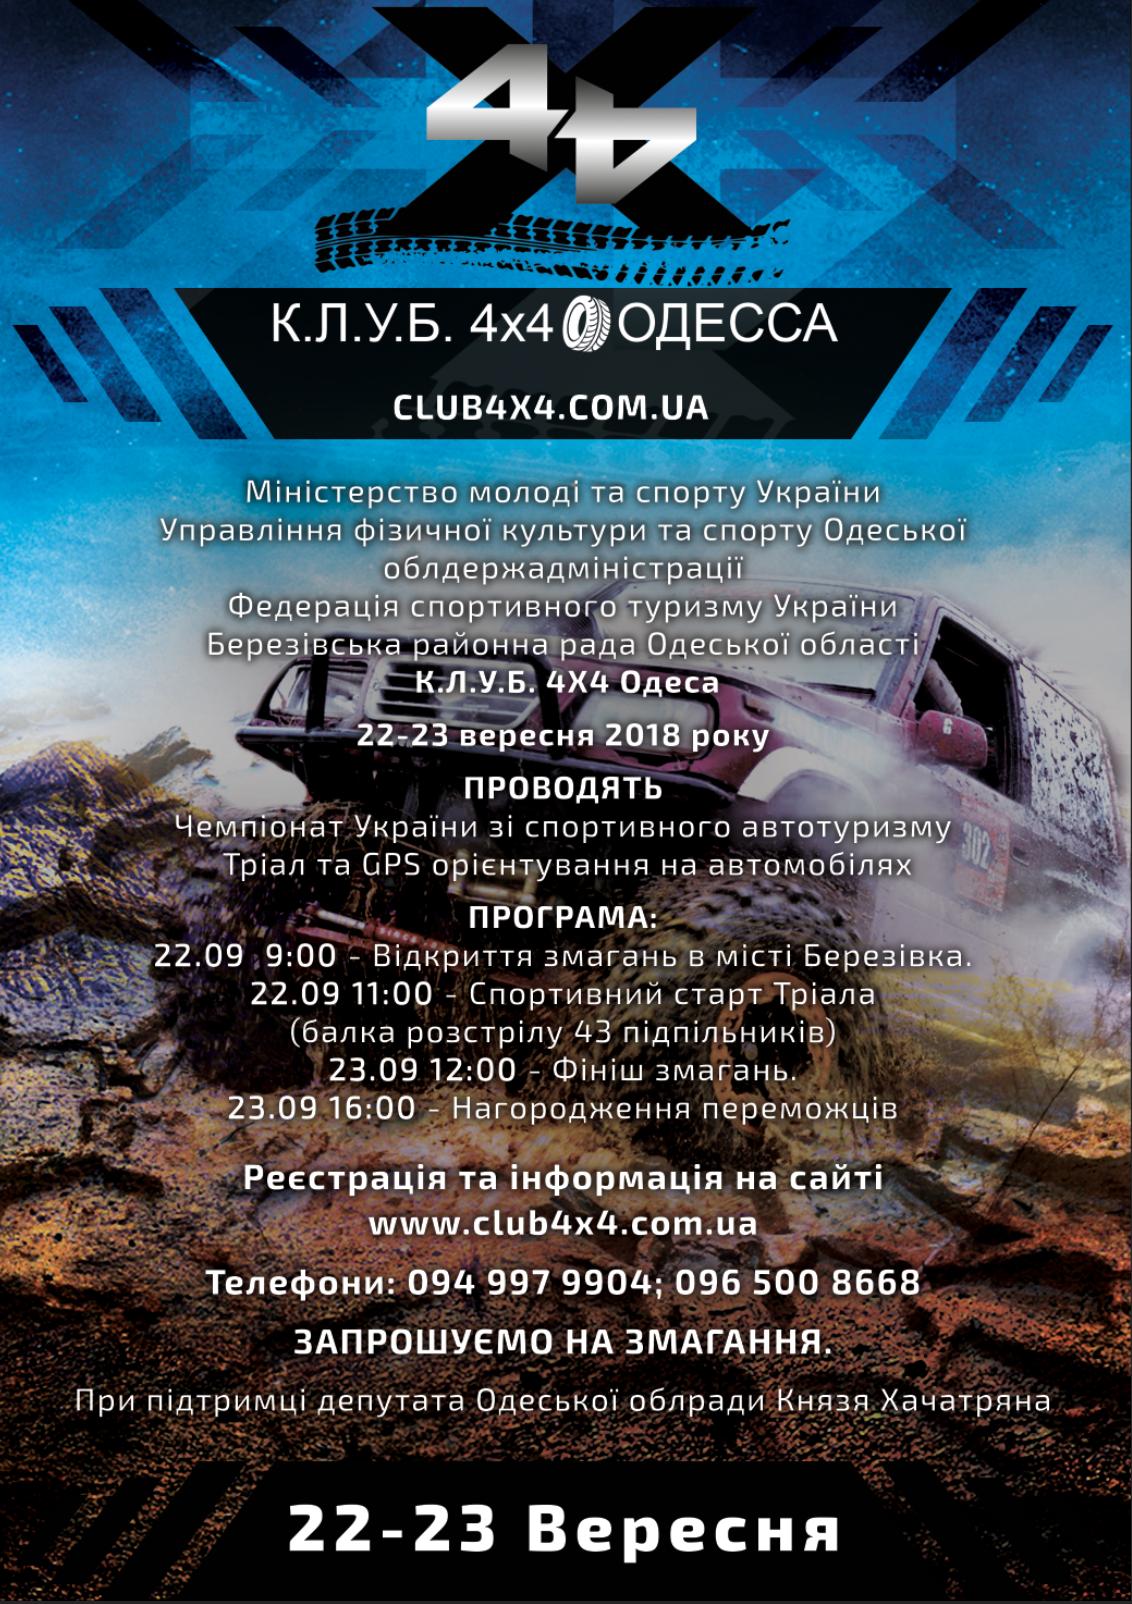 Открыта регистрация на Чемпионат Украины по спортивному авто-мото туризму 2018